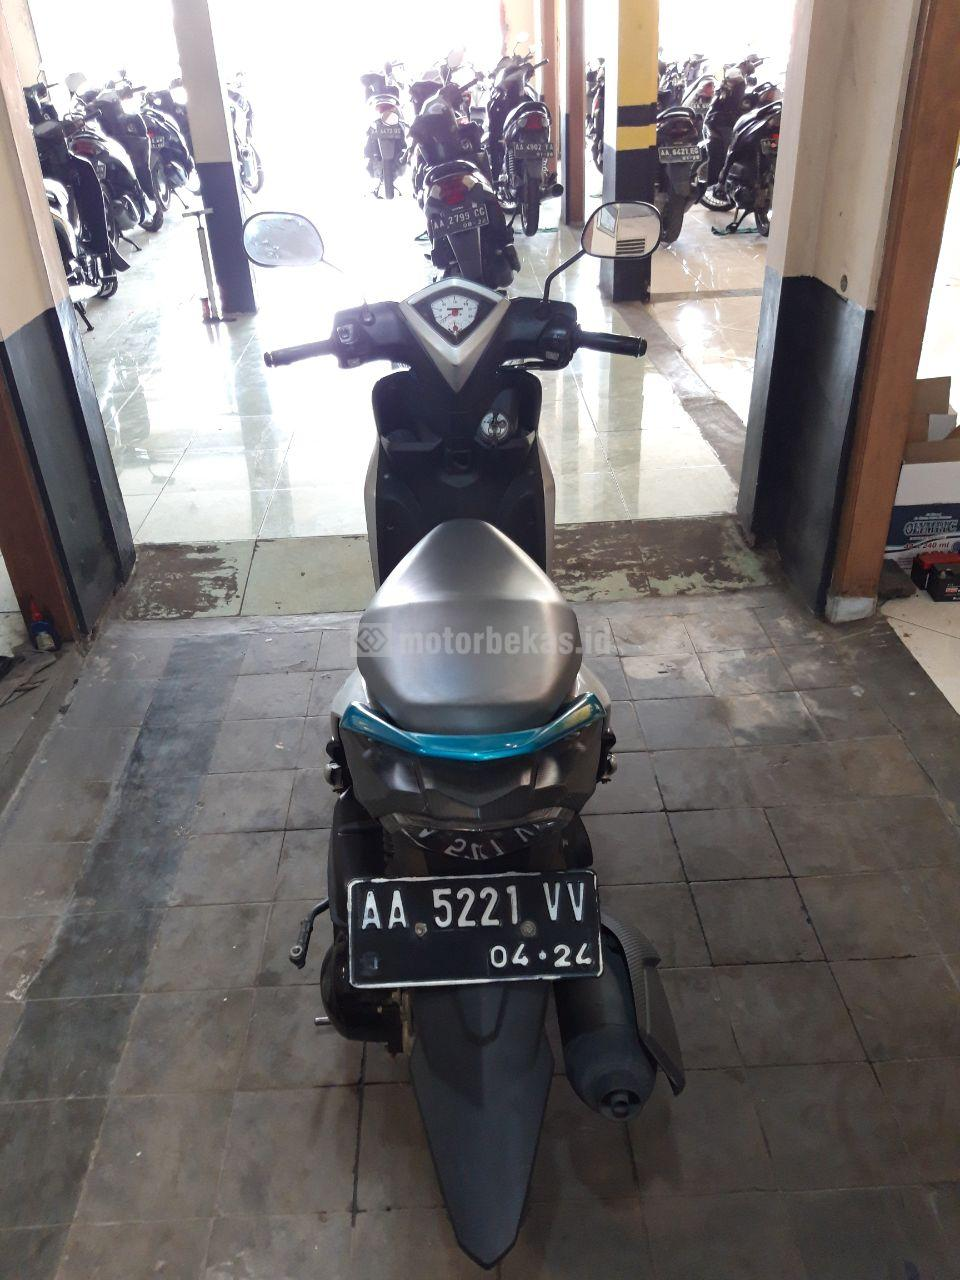 YAMAHA MIO S  3373 motorbekas.id